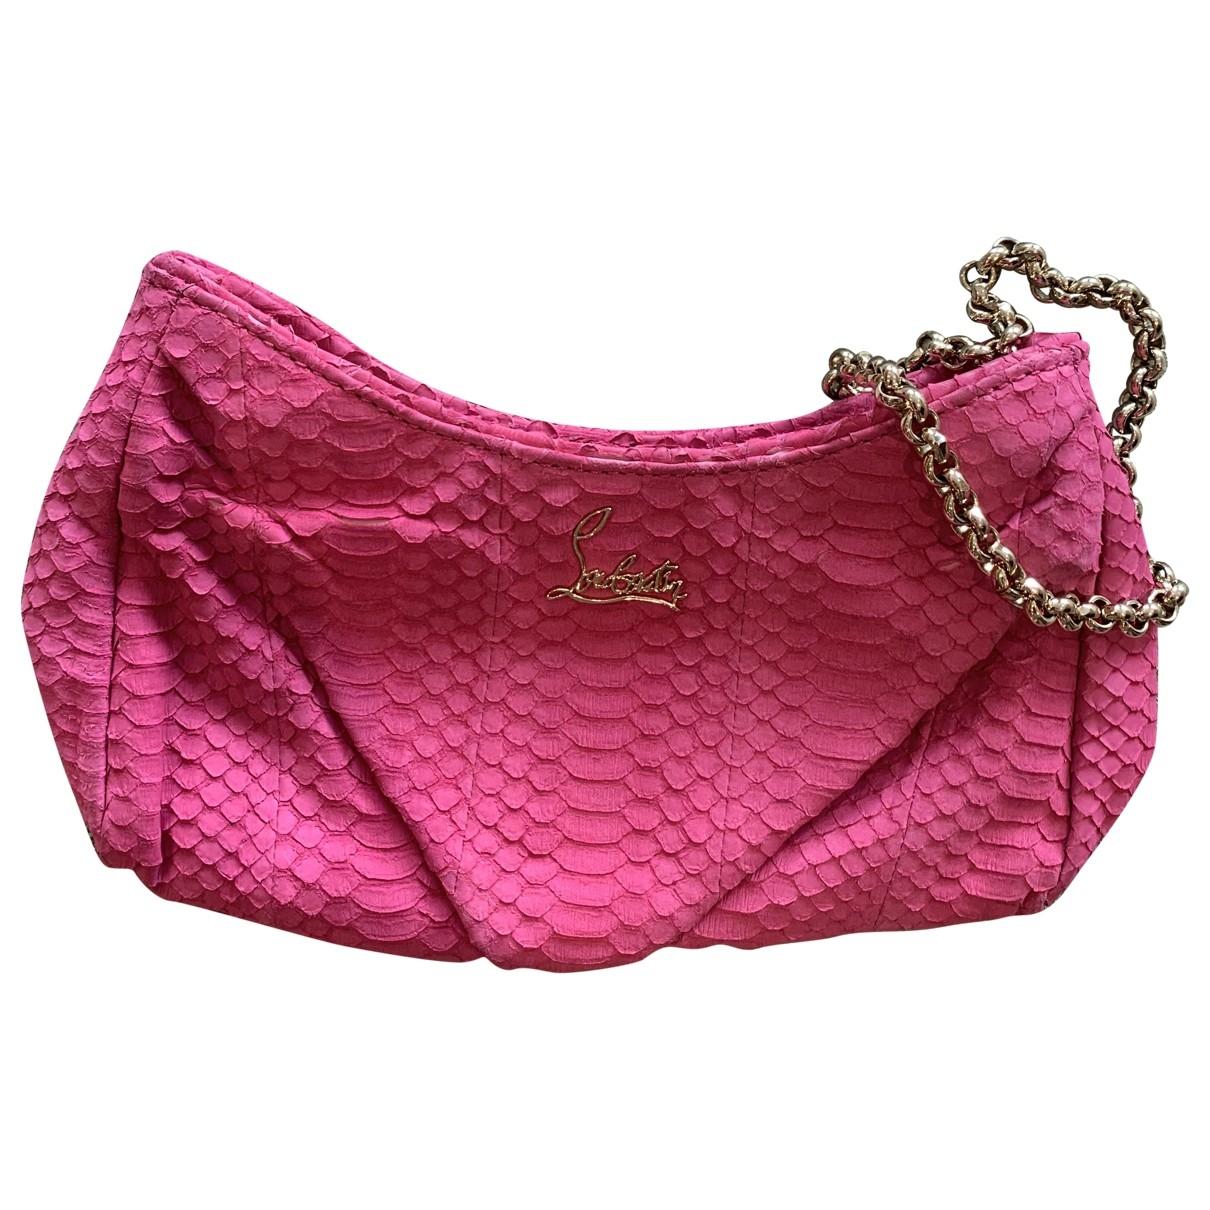 Christian Louboutin \N Pink Water snake handbag for Women \N